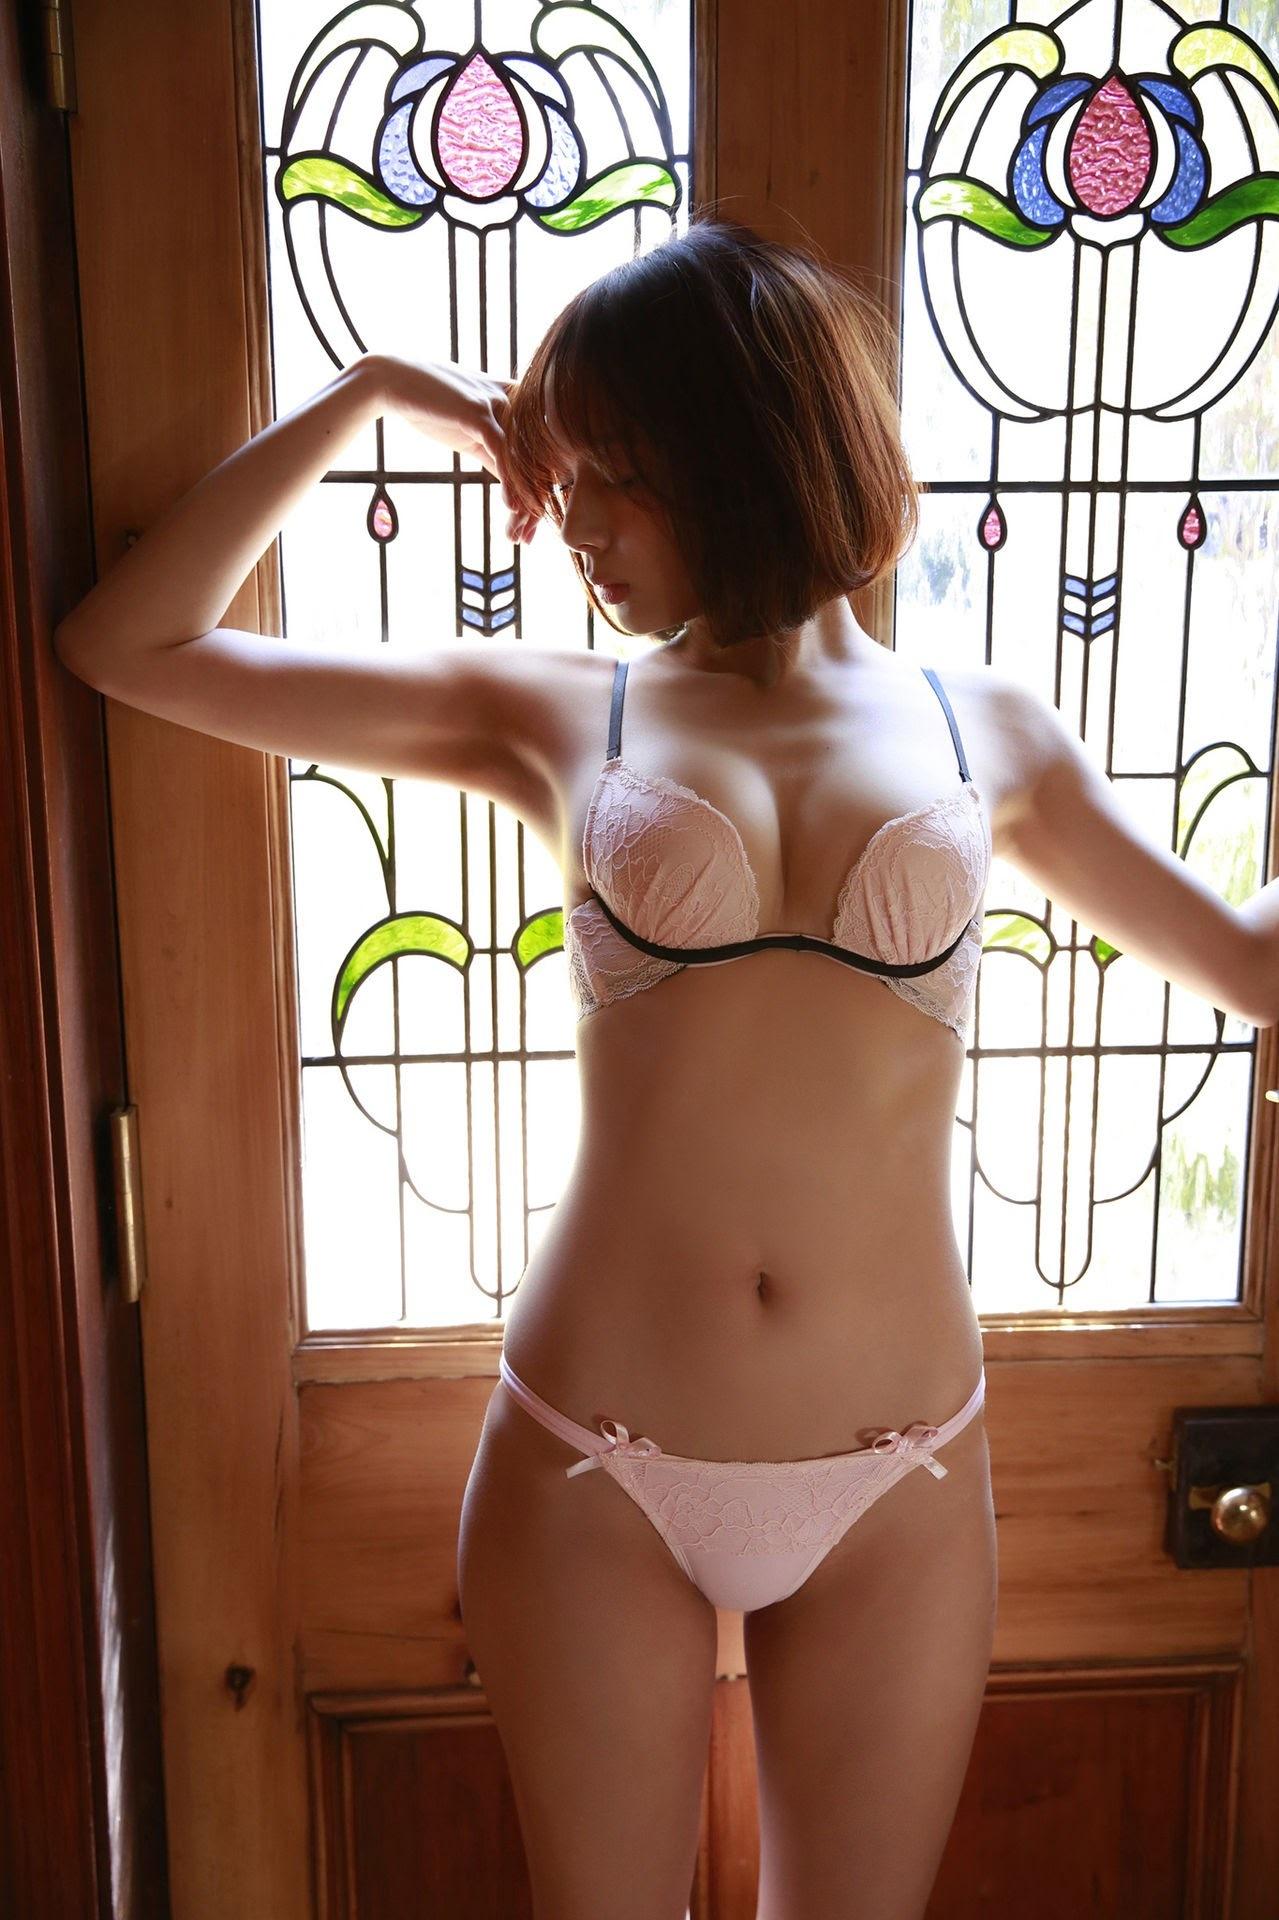 23 years old Shaka Okada, who is also a professional mahjong player038